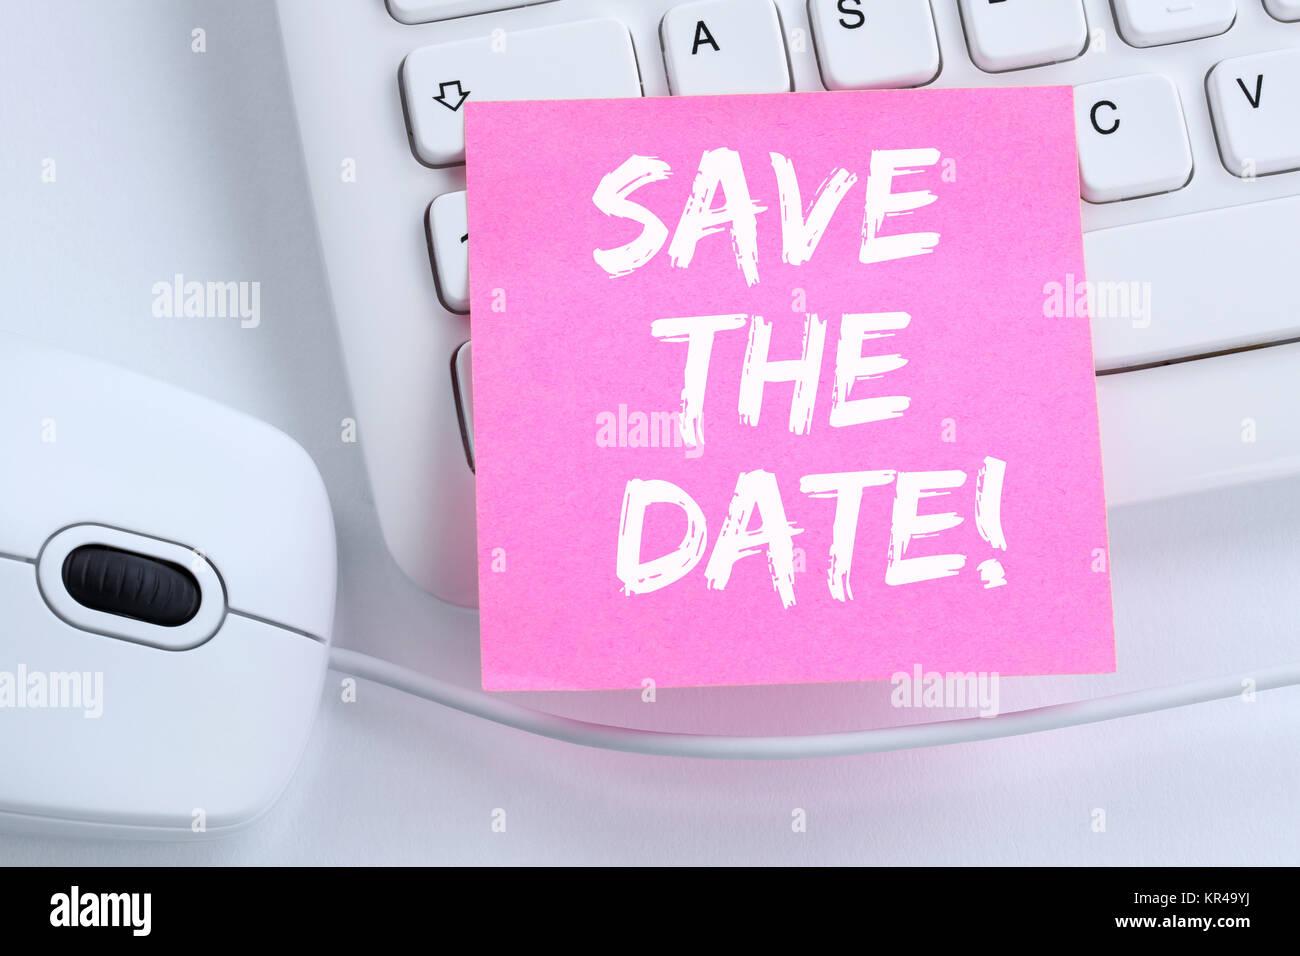 Save the date Termin Datum Einladung Verabredung Büro Computer Tastatur - Stock Image